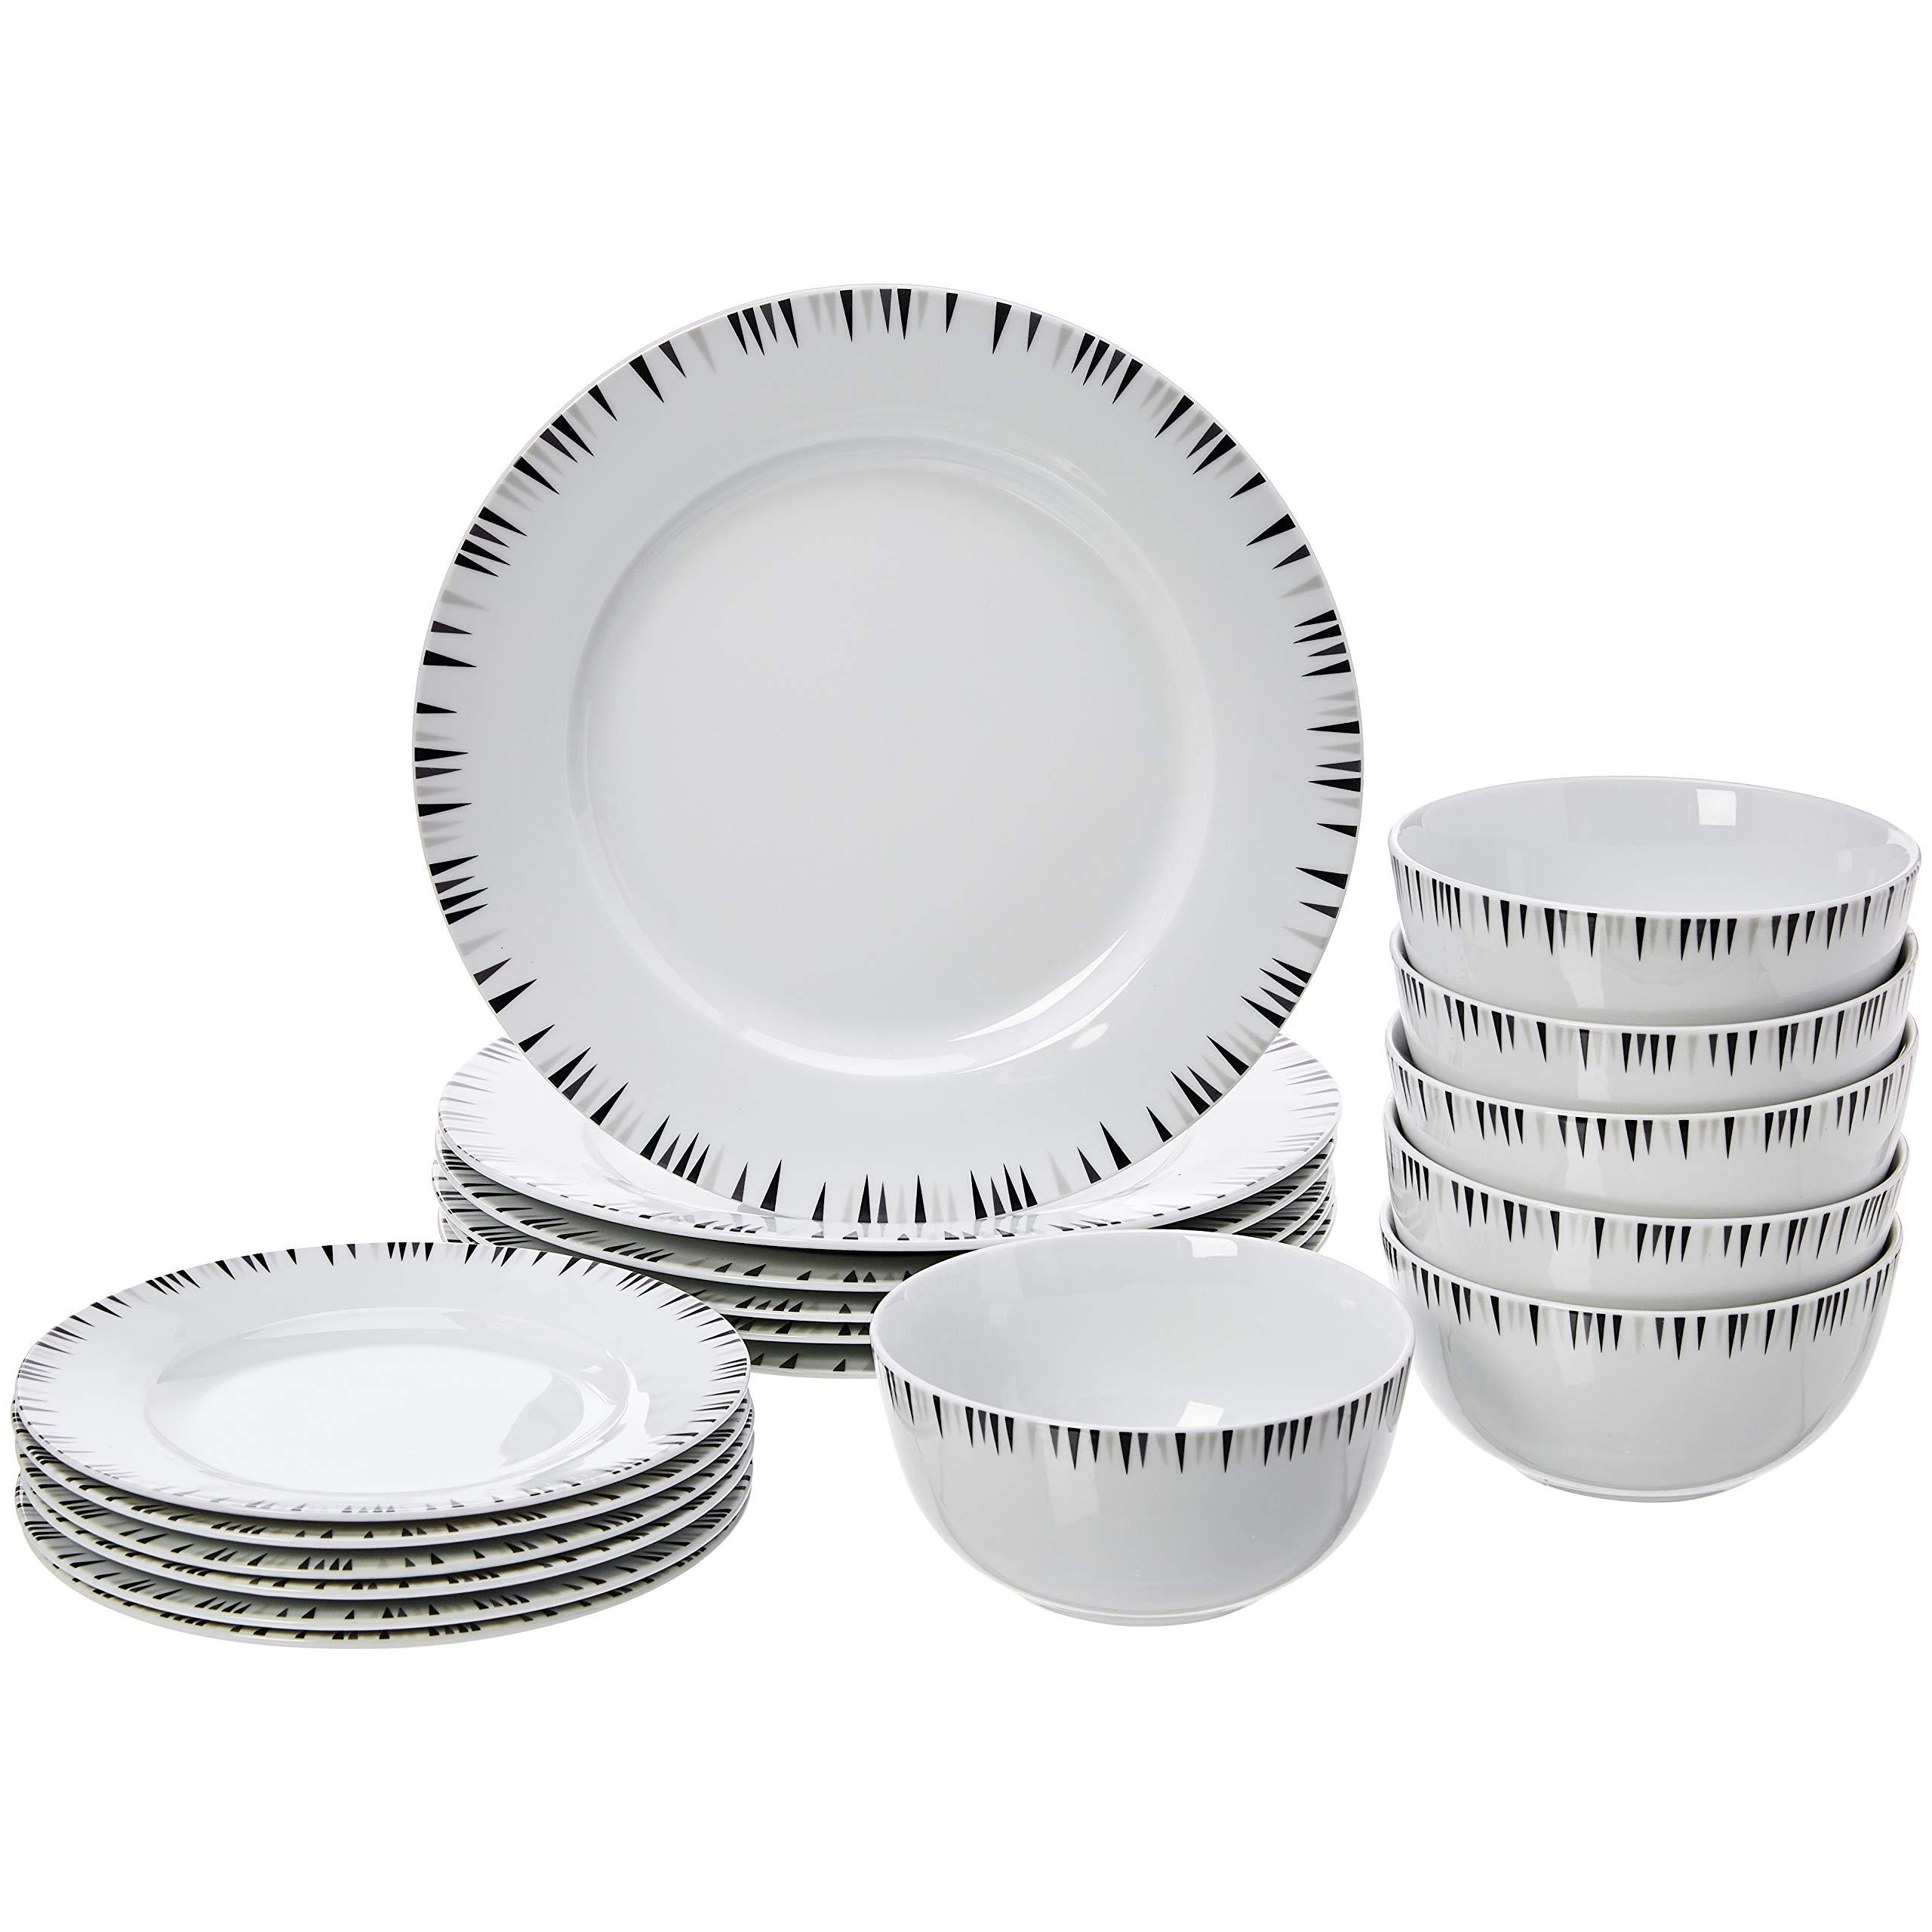 AmazonBasics 18 Piece Dinnerware Set Bungalow